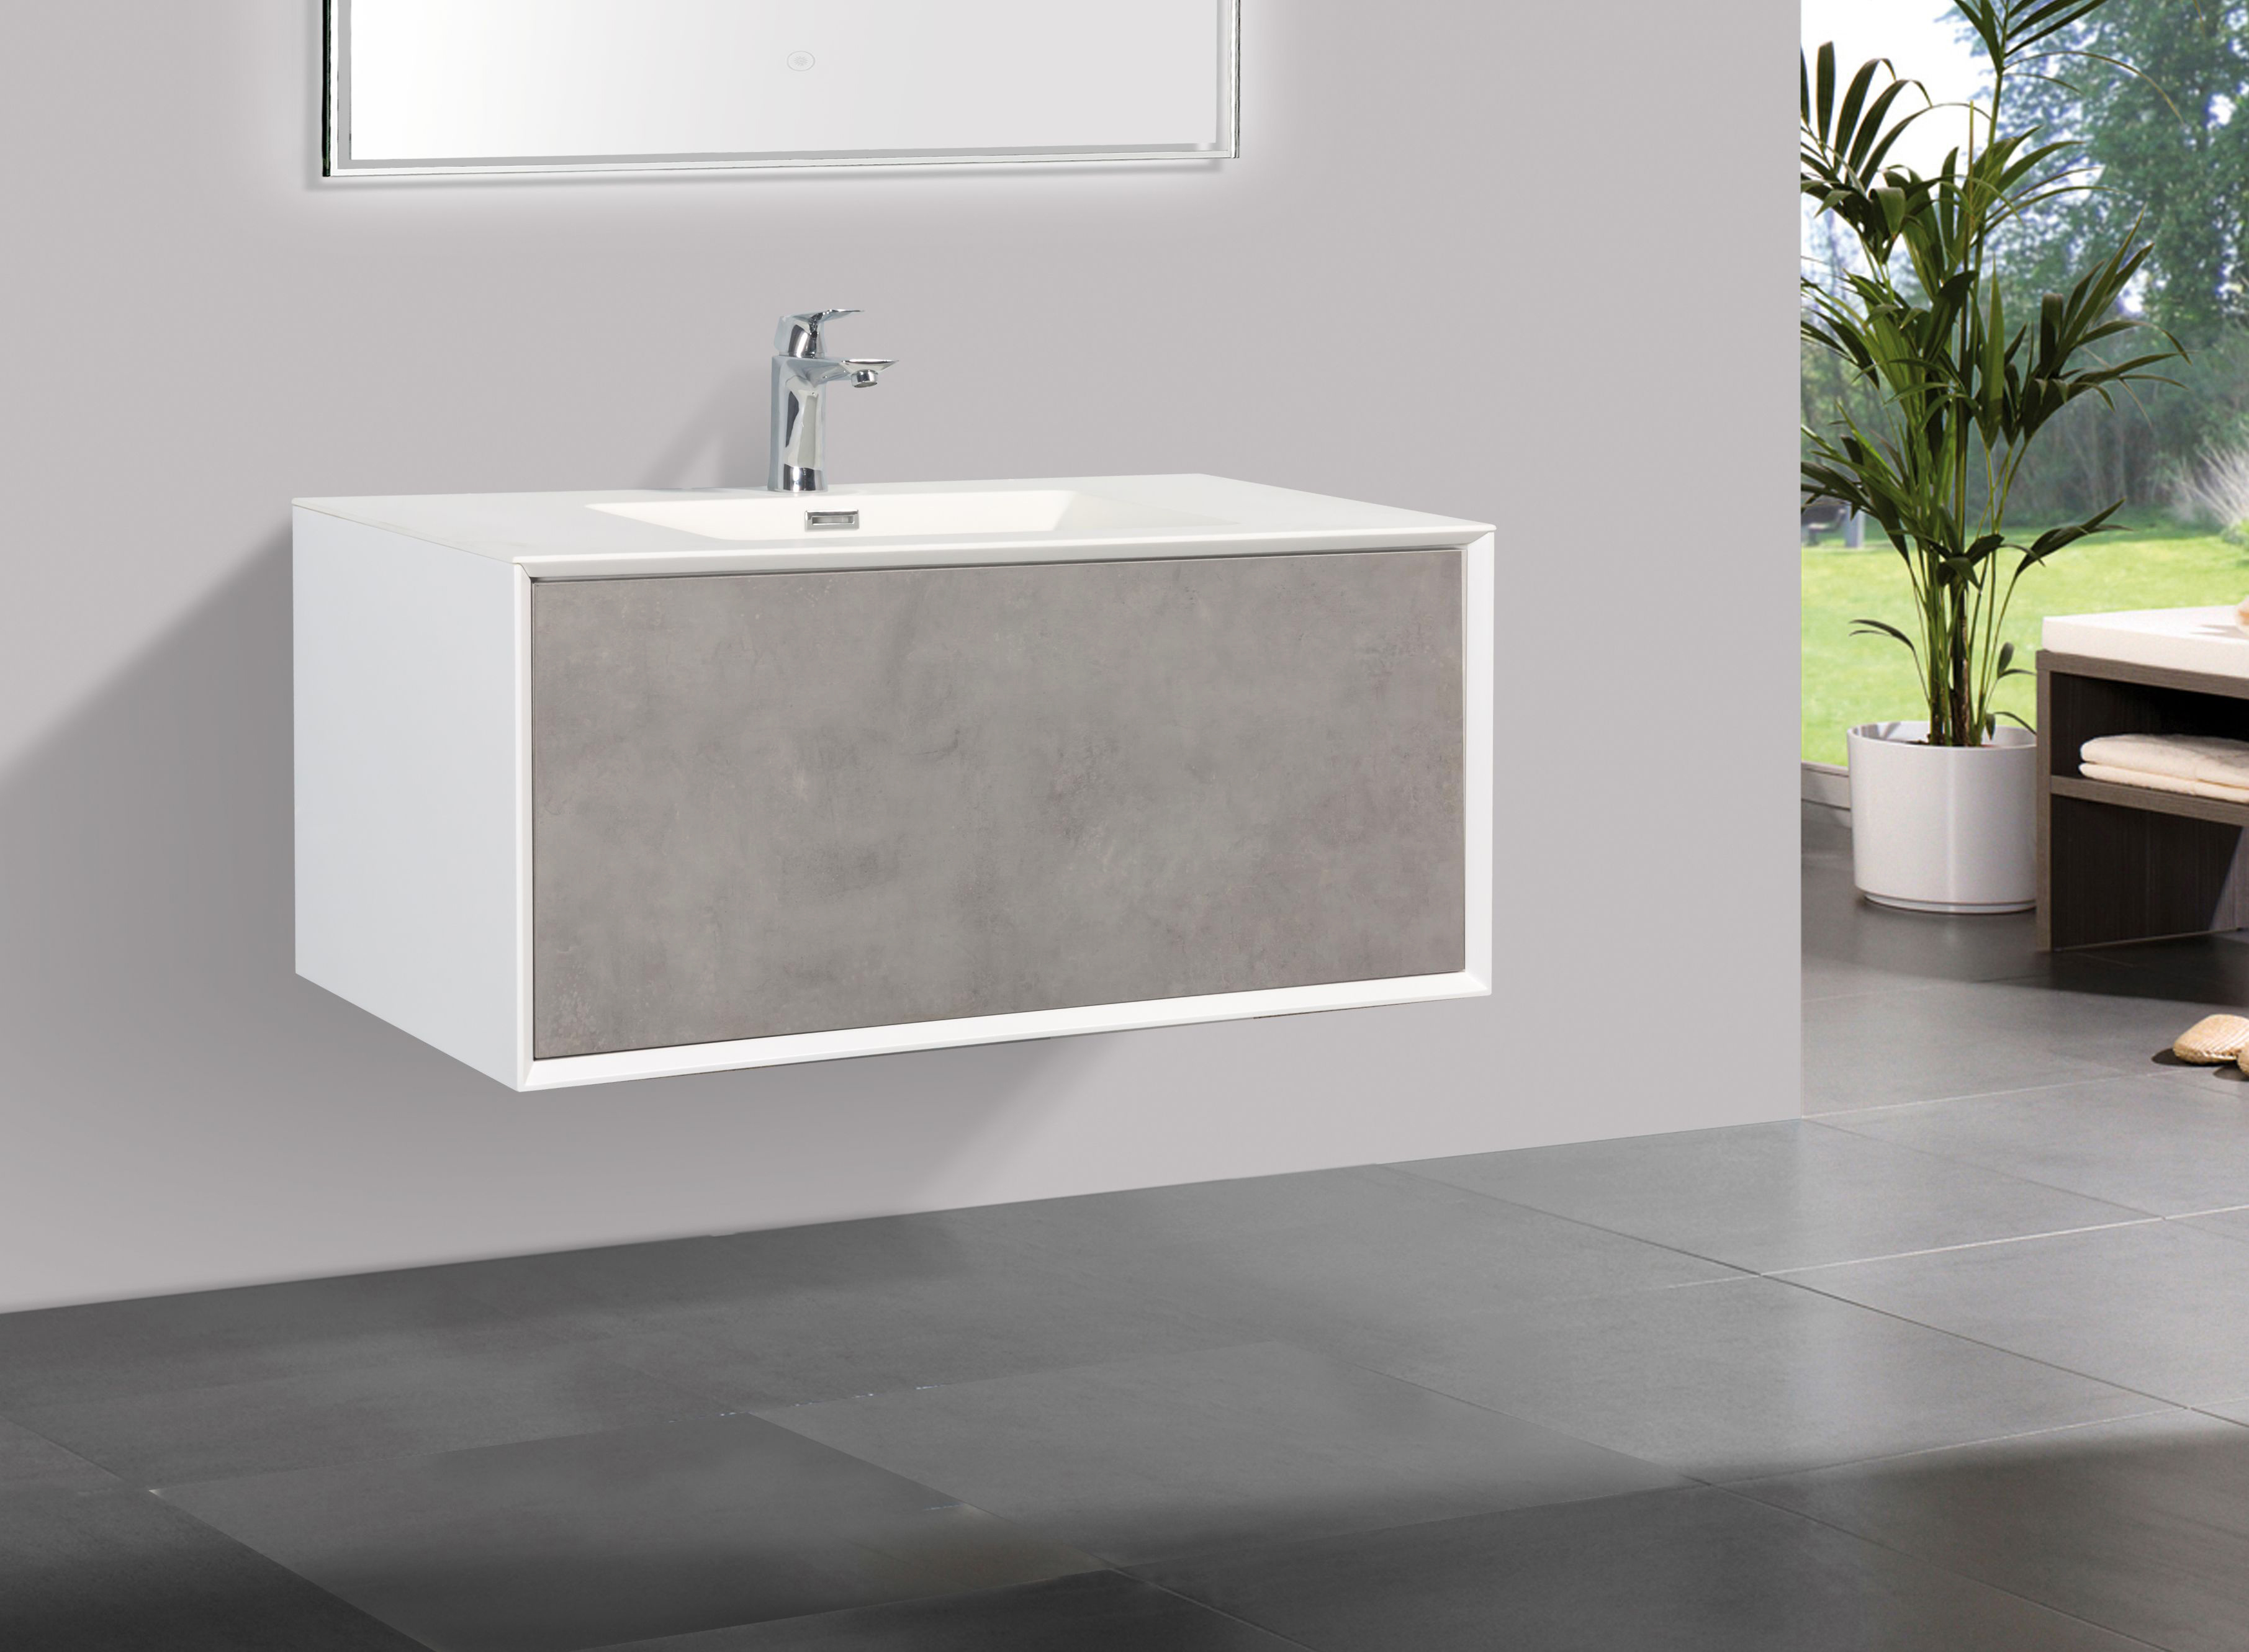 Badmöbel Unterschrank inkl. Waschtisch SELVA 75 (beton)